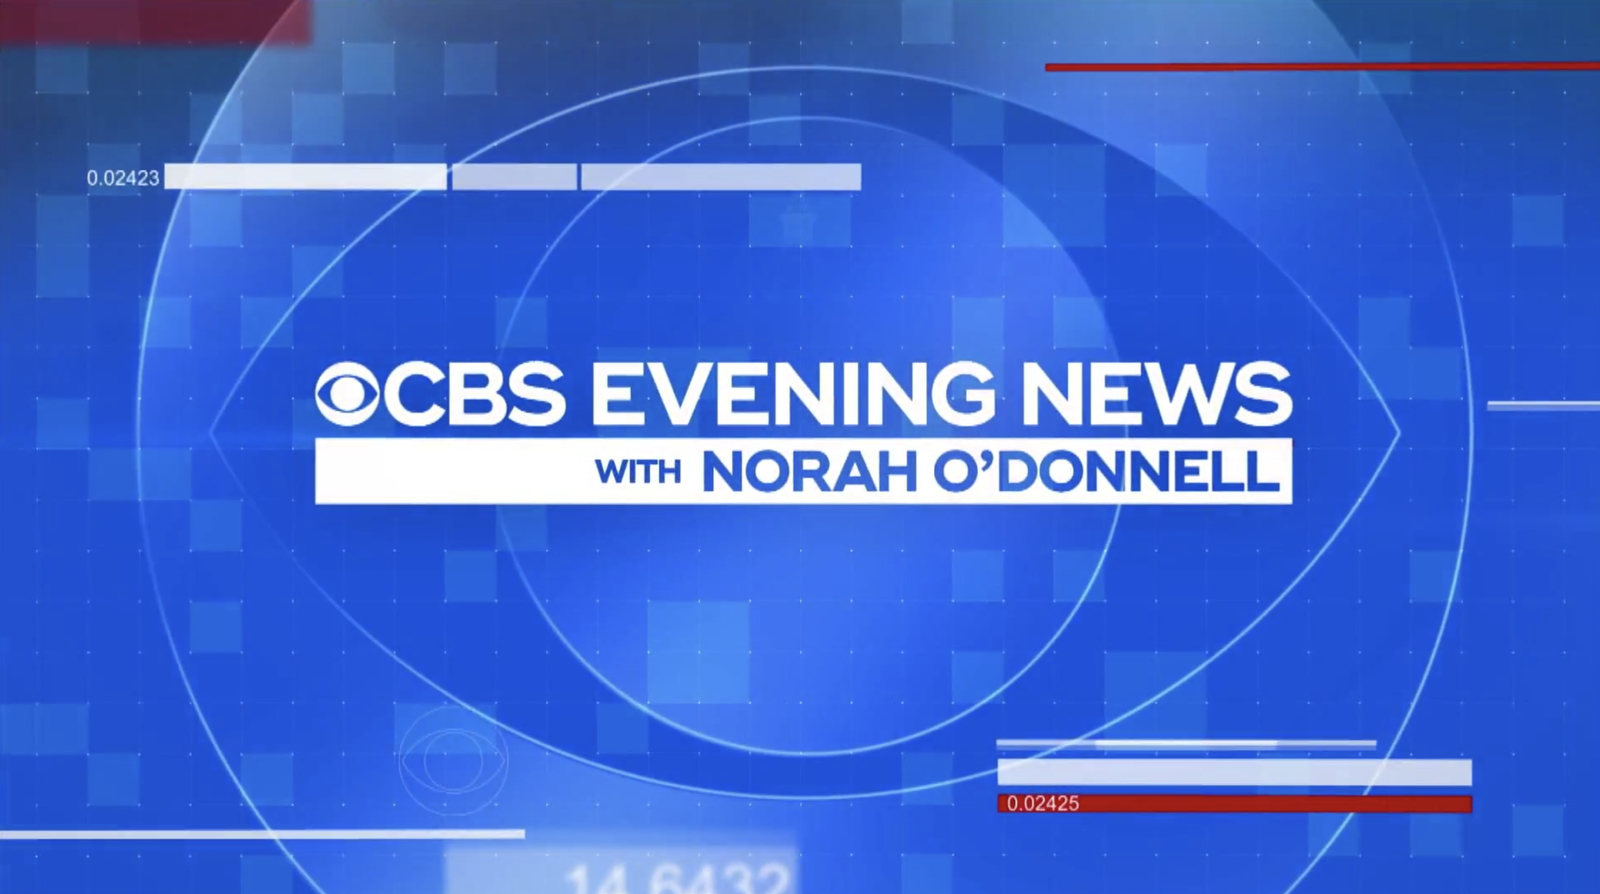 NCS_CBS-Evening-News_Motion-Design_Washington_009